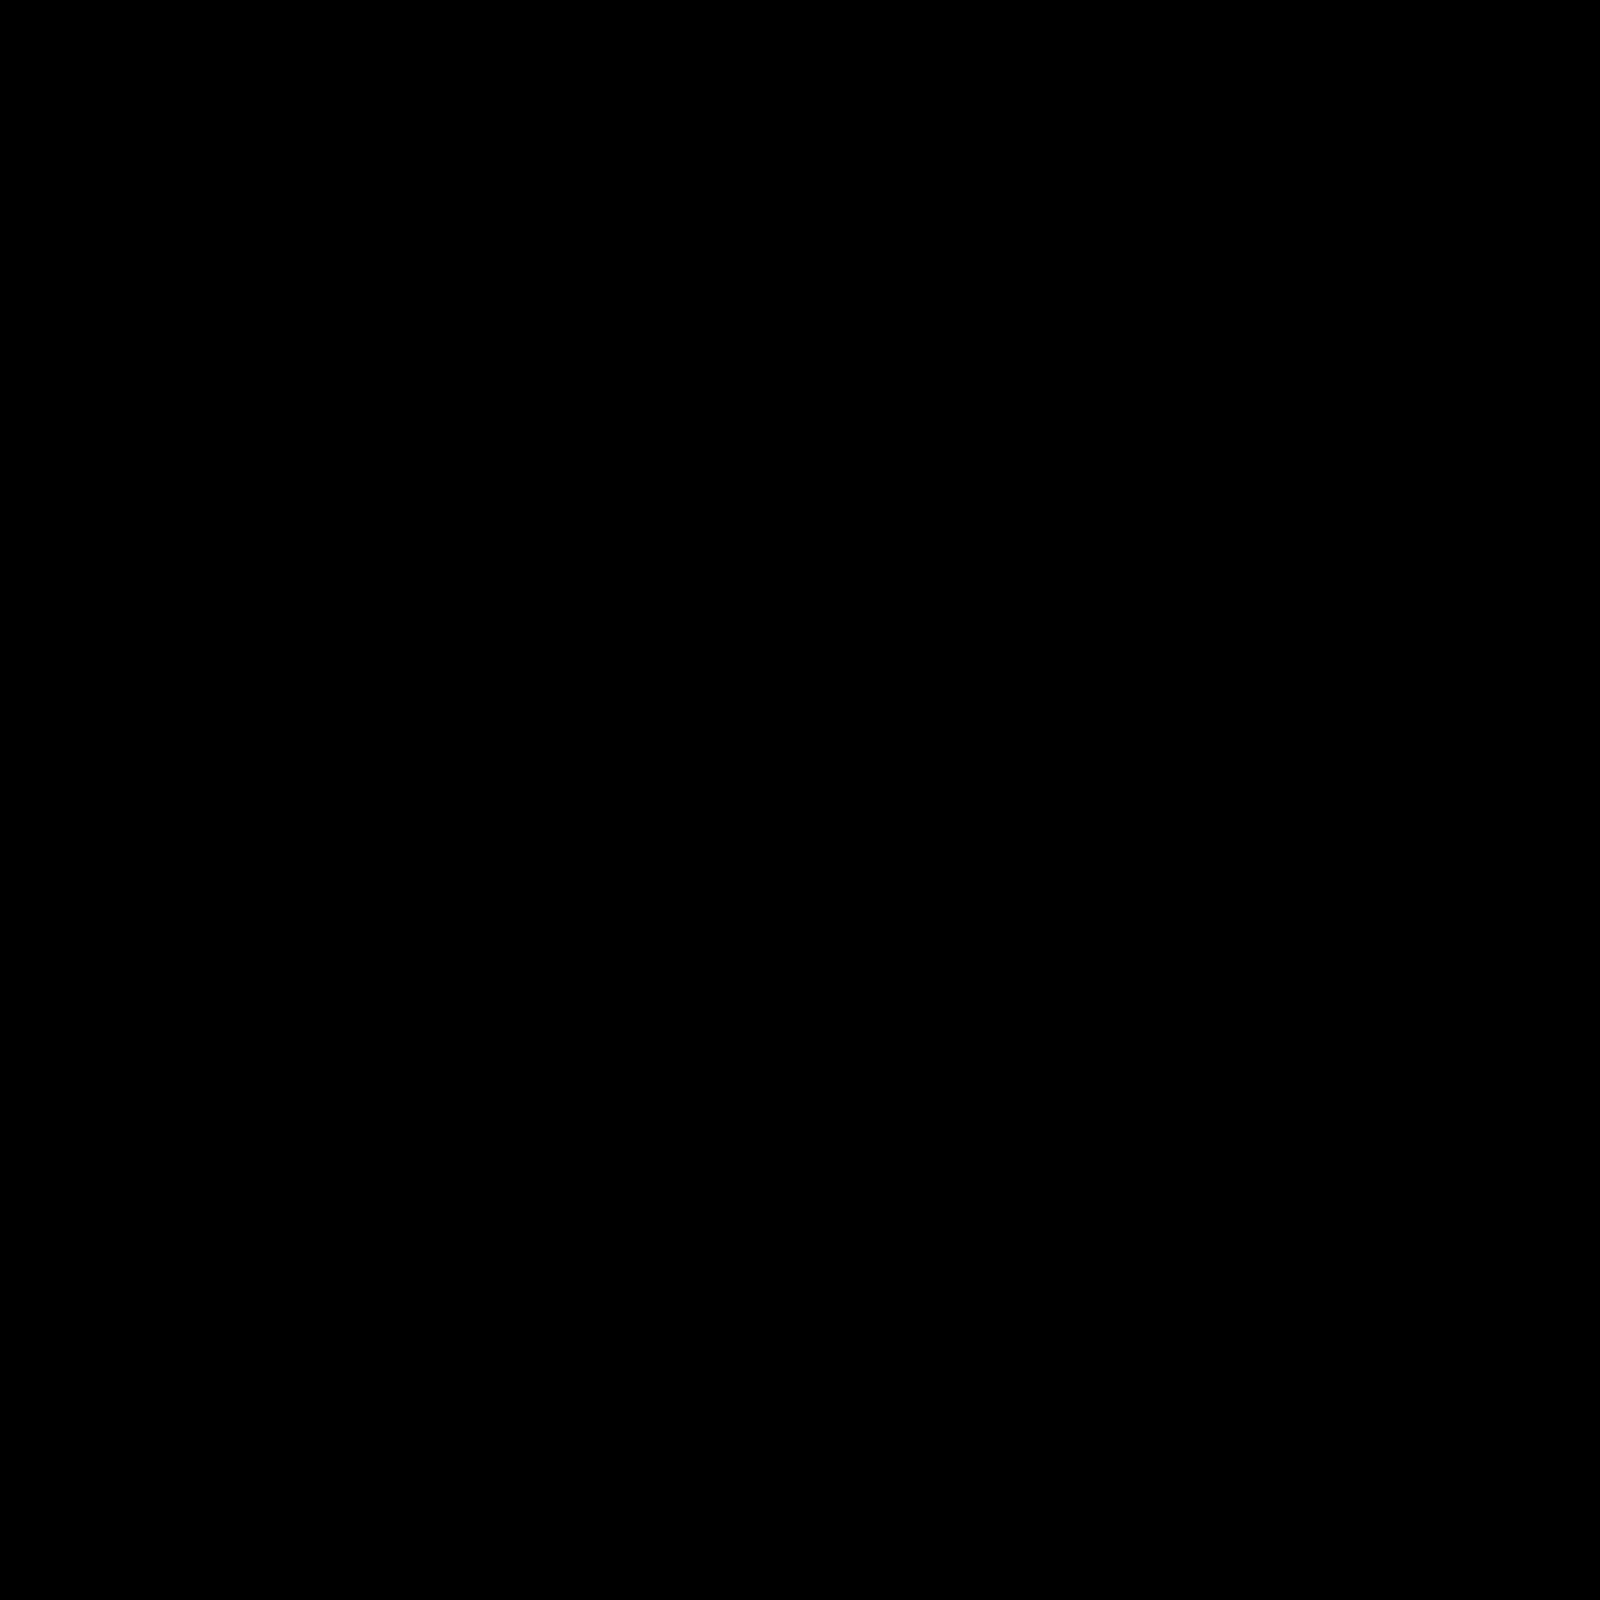 Suéter icon